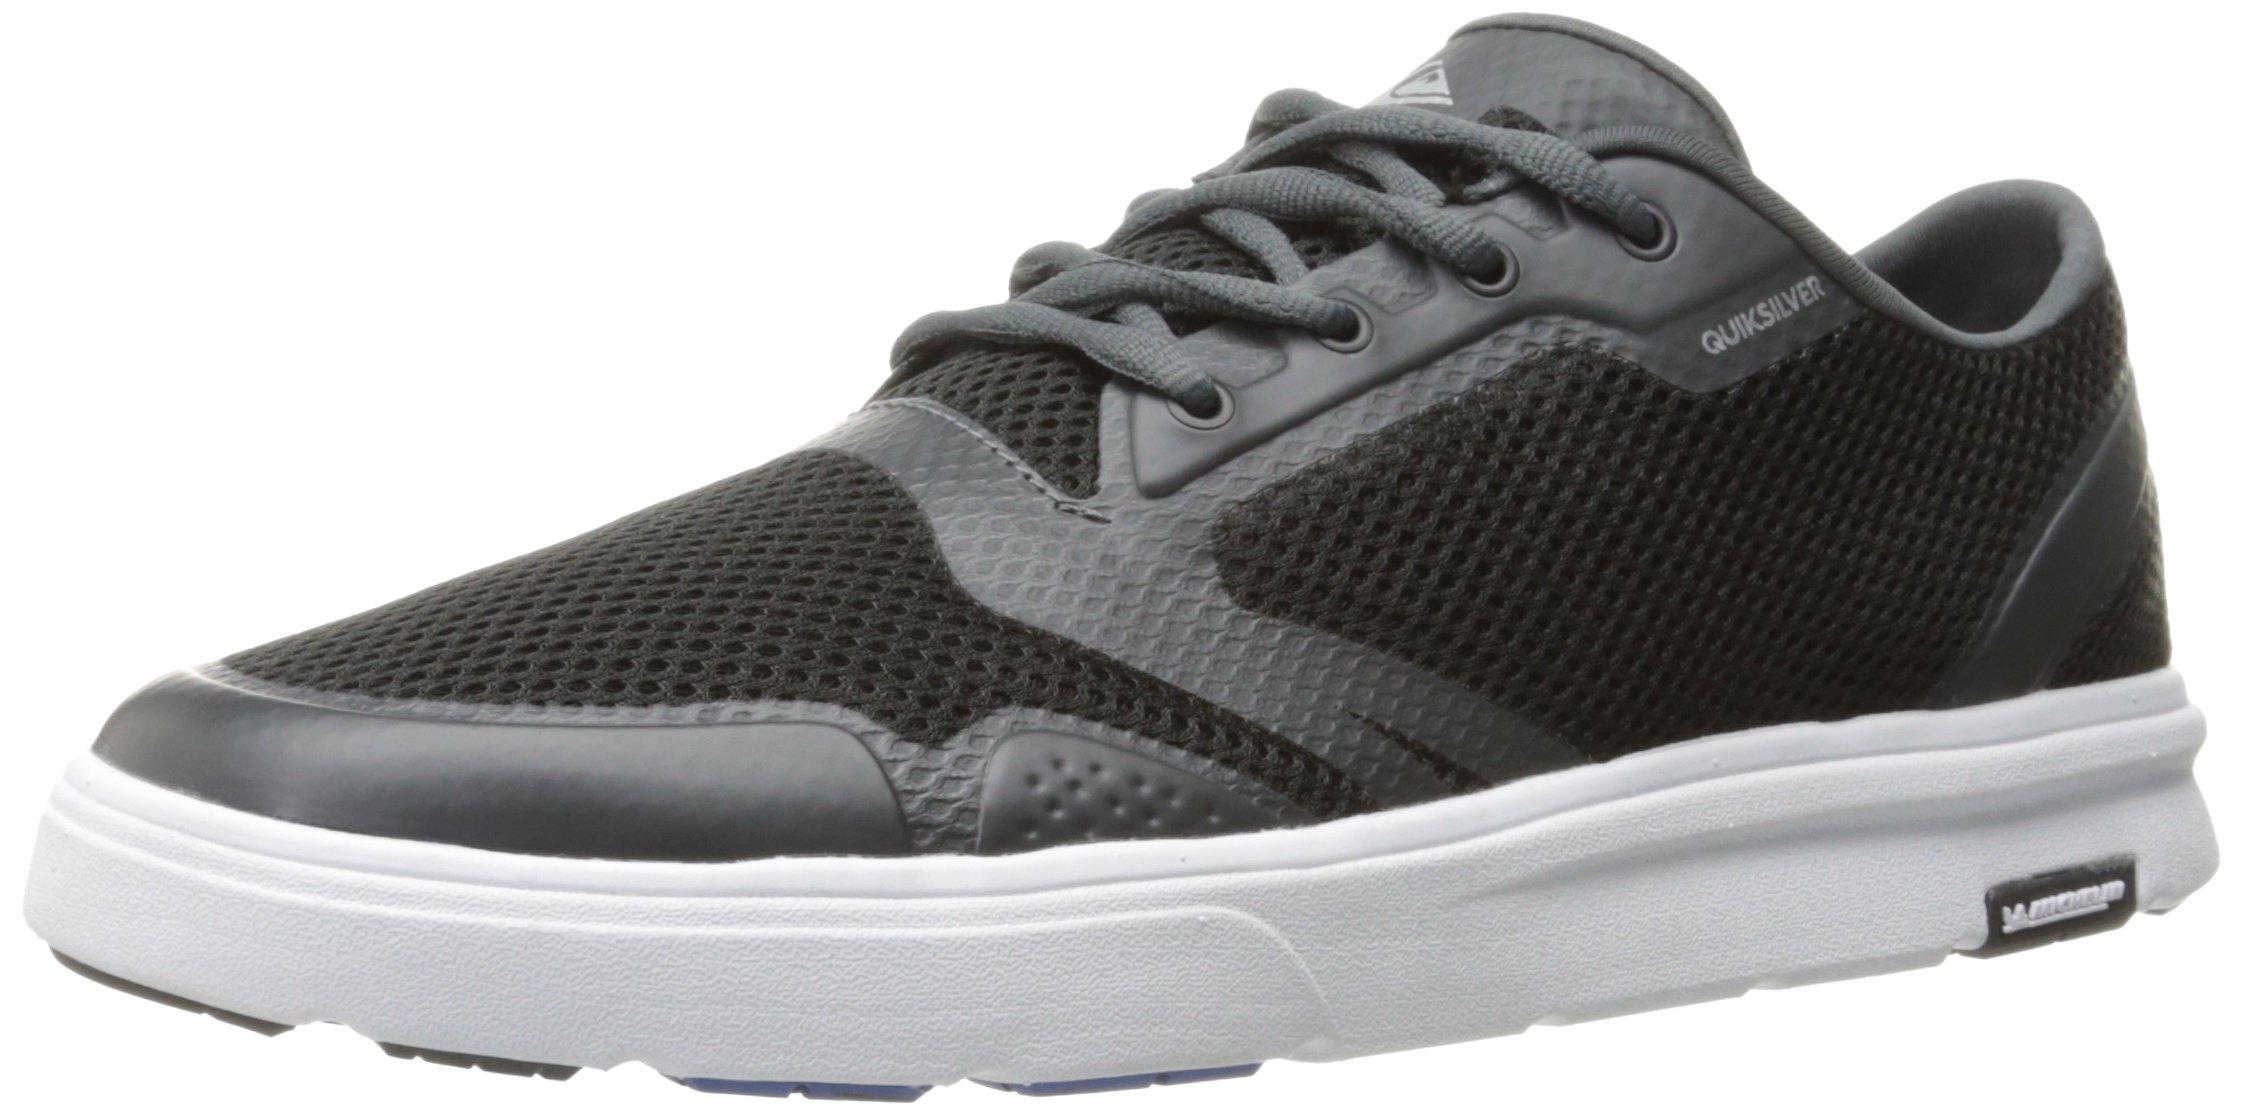 Quiksilver Men's Amphibian Plus Skate Shoe, Black/Grey/White, 9(42) D US